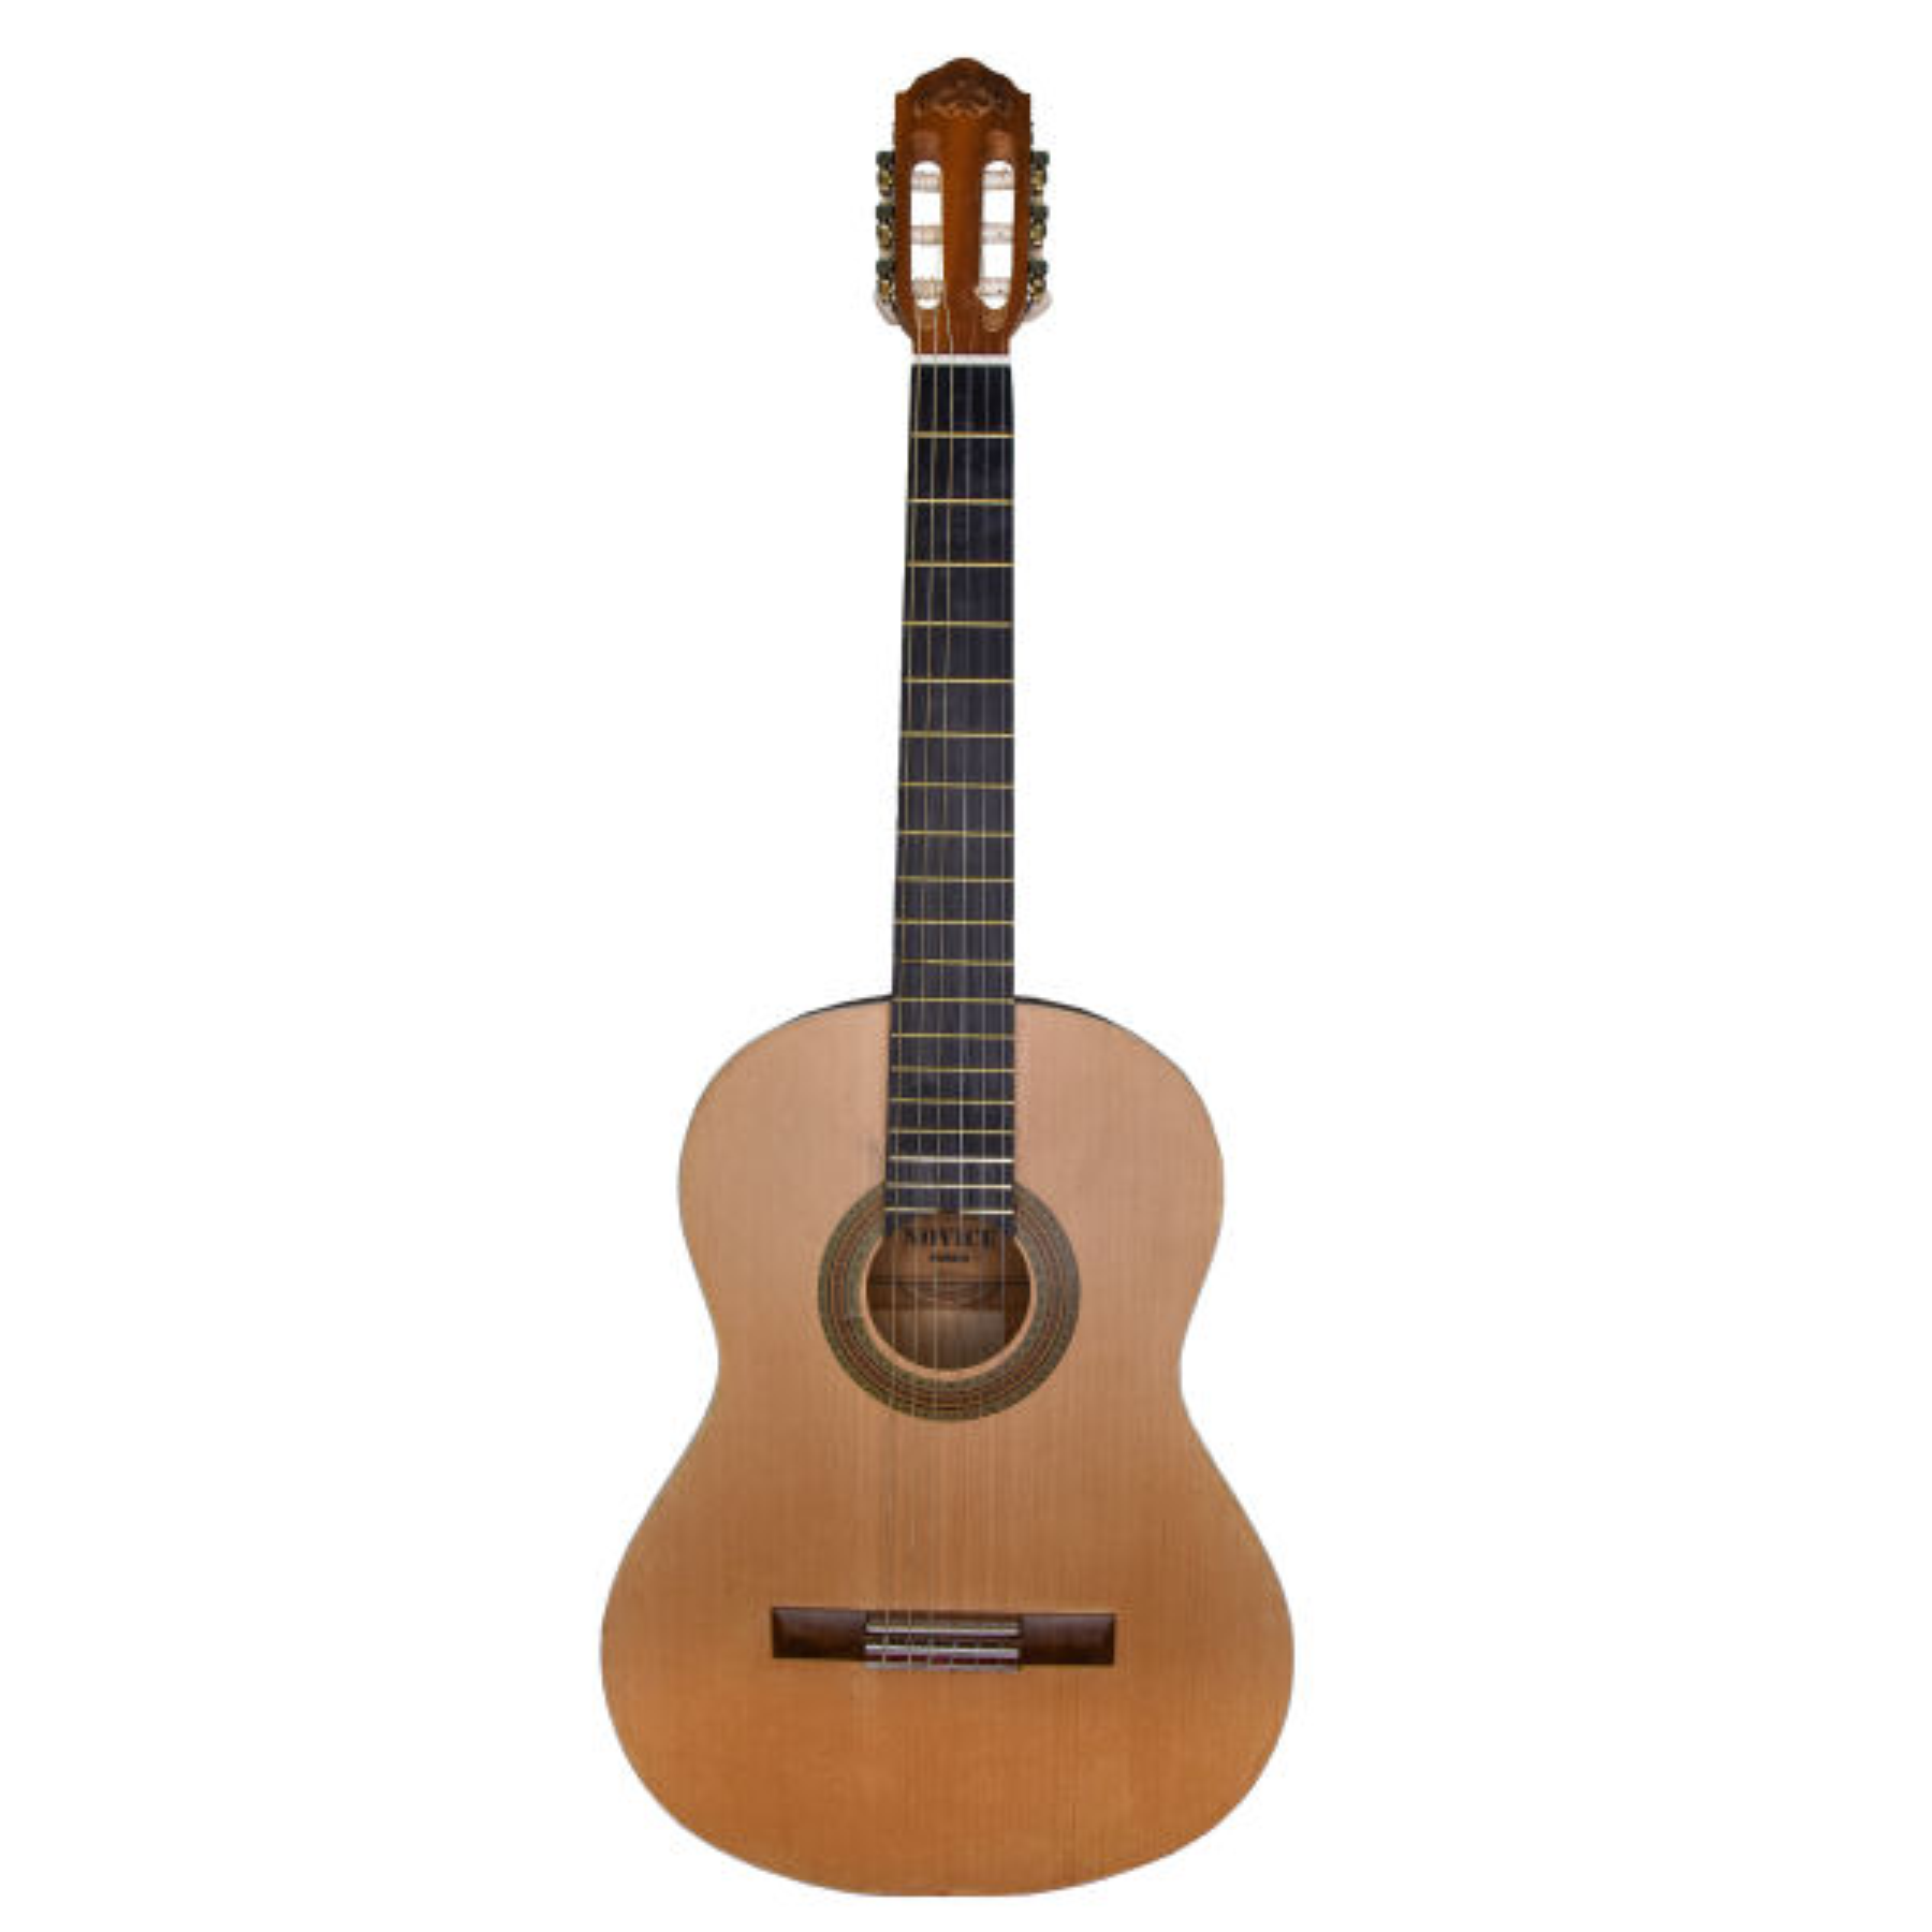 گیتار کلاسیک نووایس مدل لئونارد کد 002